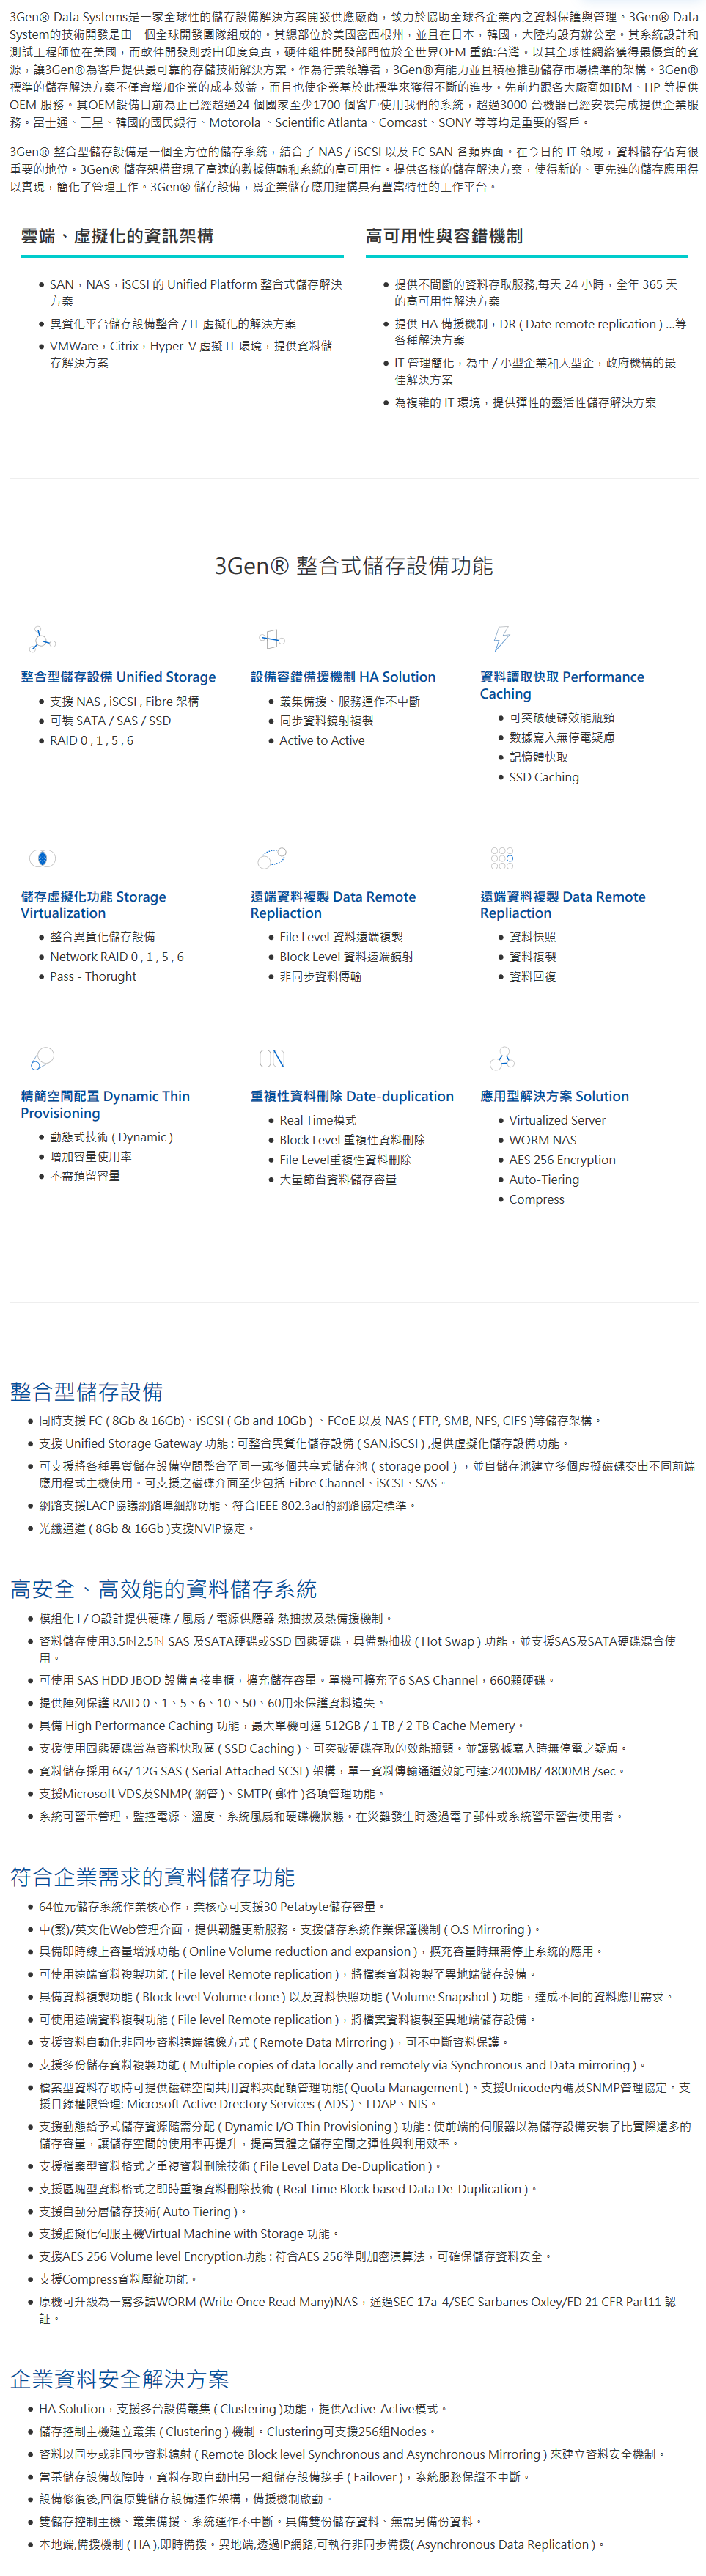 Screenshot_2019-05-18 樂高電腦股份有限公司.png